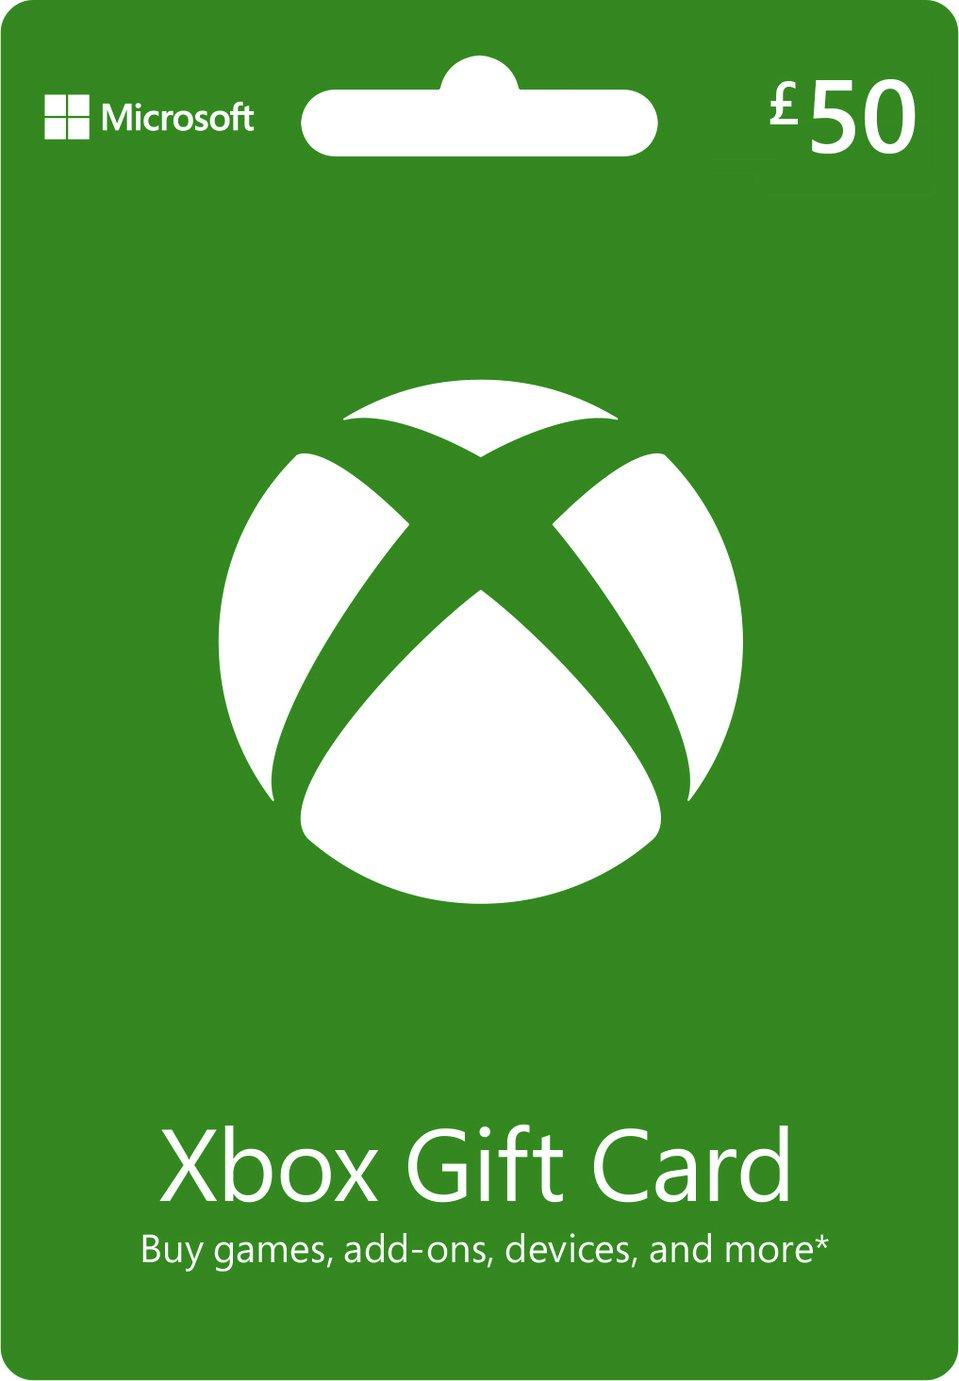 Xbox Xbox Live £50 Gift Card.